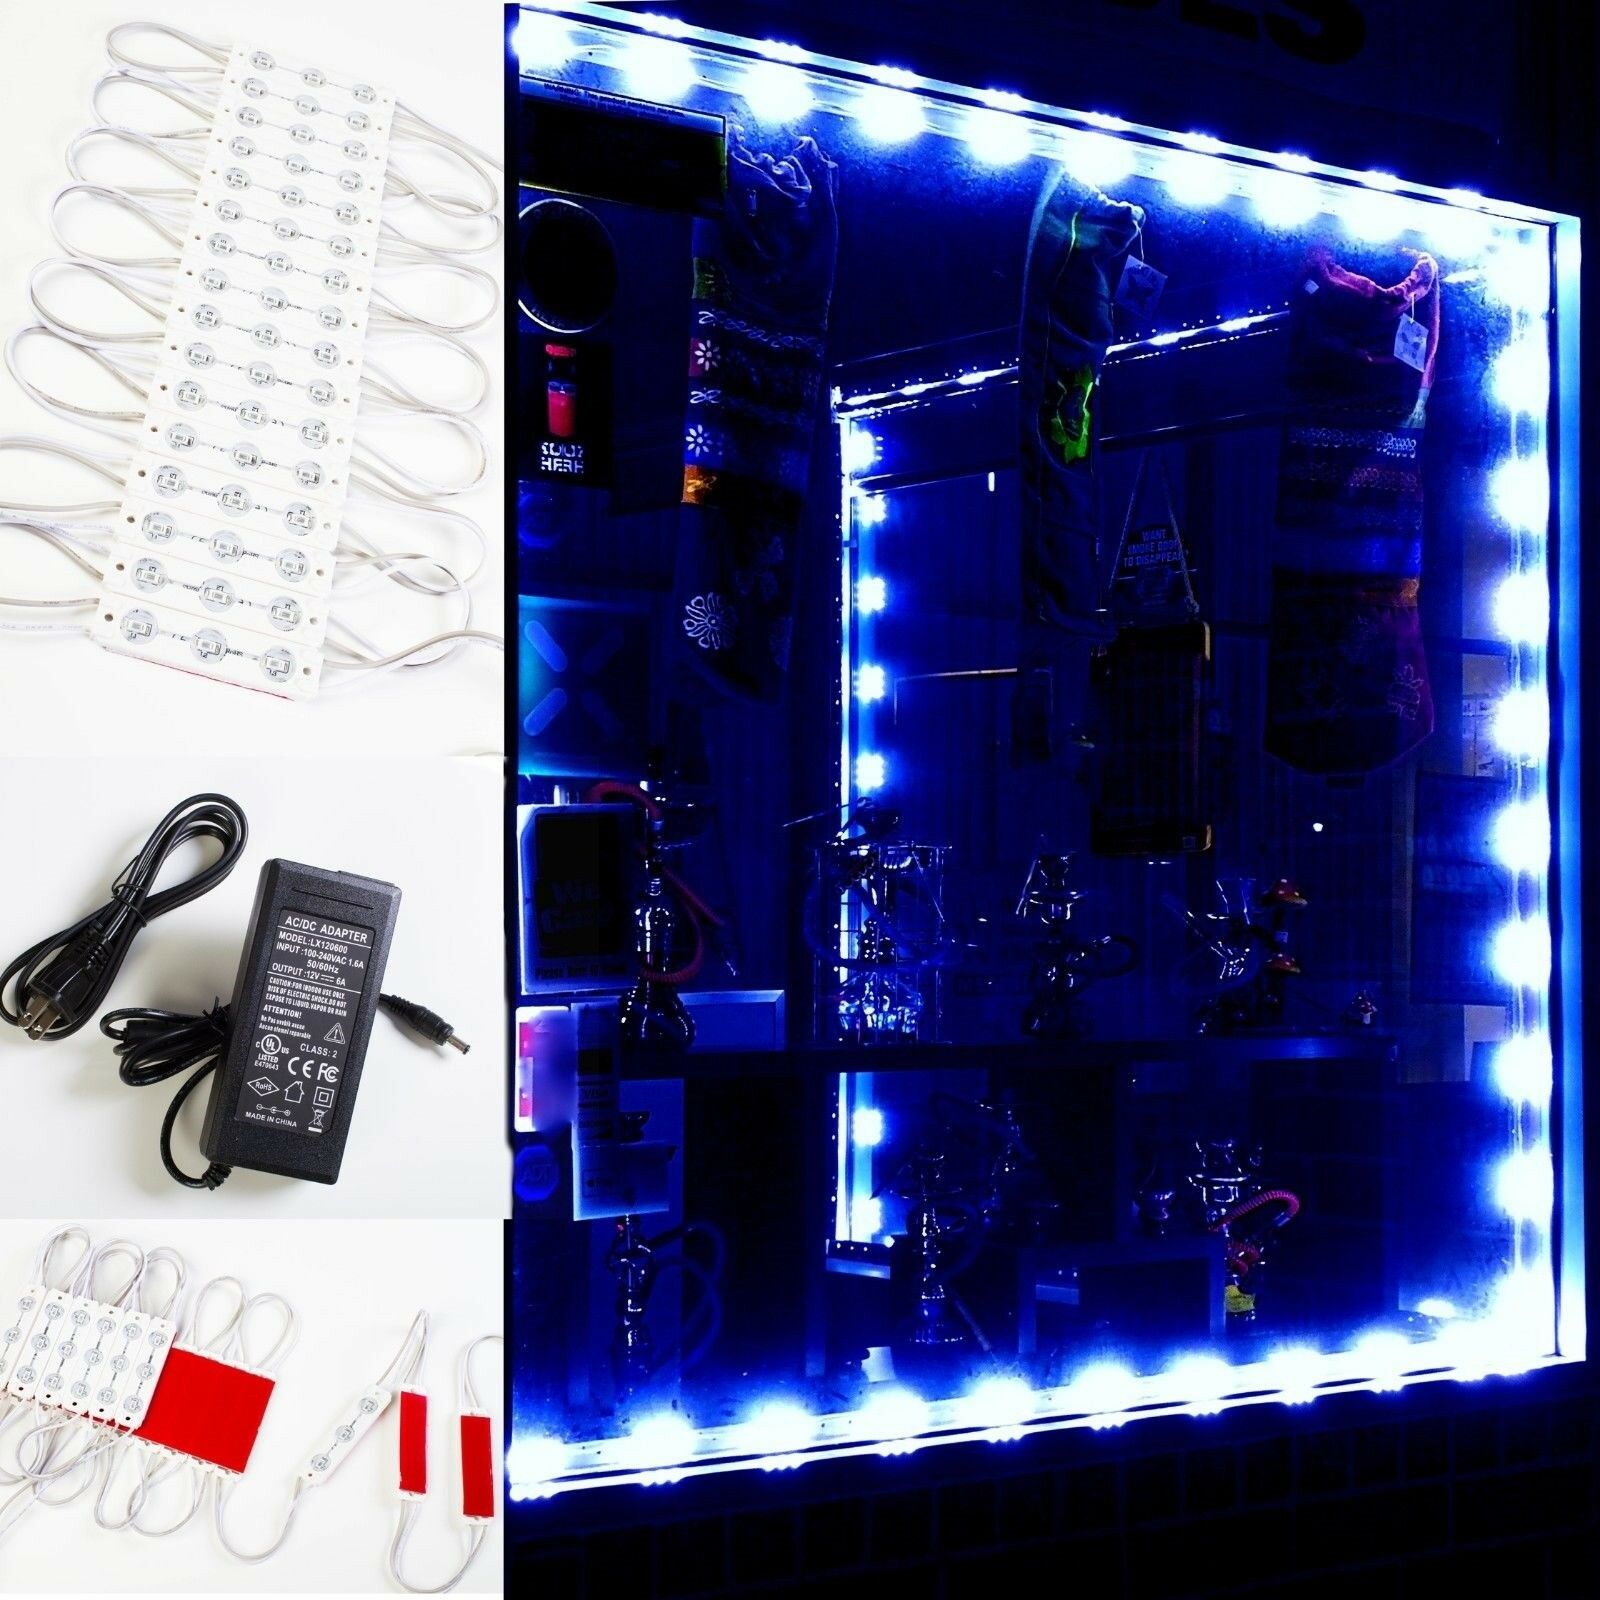 LEDUPDATES 30ft Blau STOREFRONT WINDOW LED LIGHT INSTALL KIT + UL Power supply